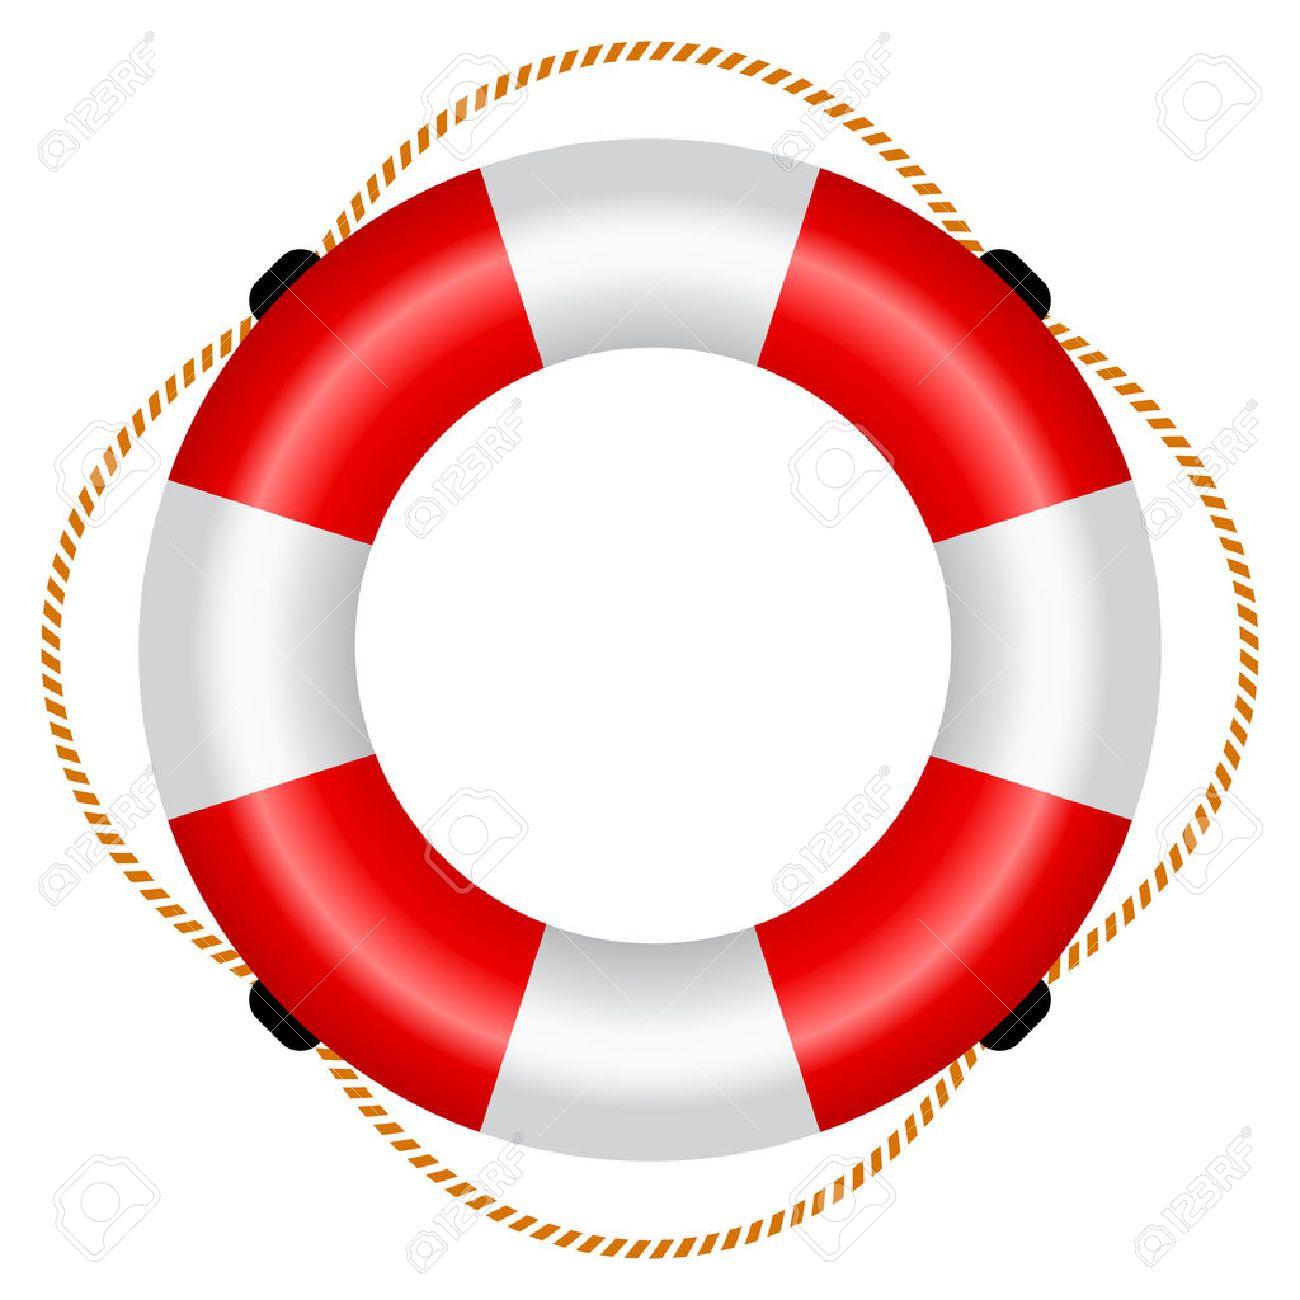 2 533 life saver stock vector illustration and royalty free life rh 123rf com surf lifesaver clipart surf lifesaver clipart